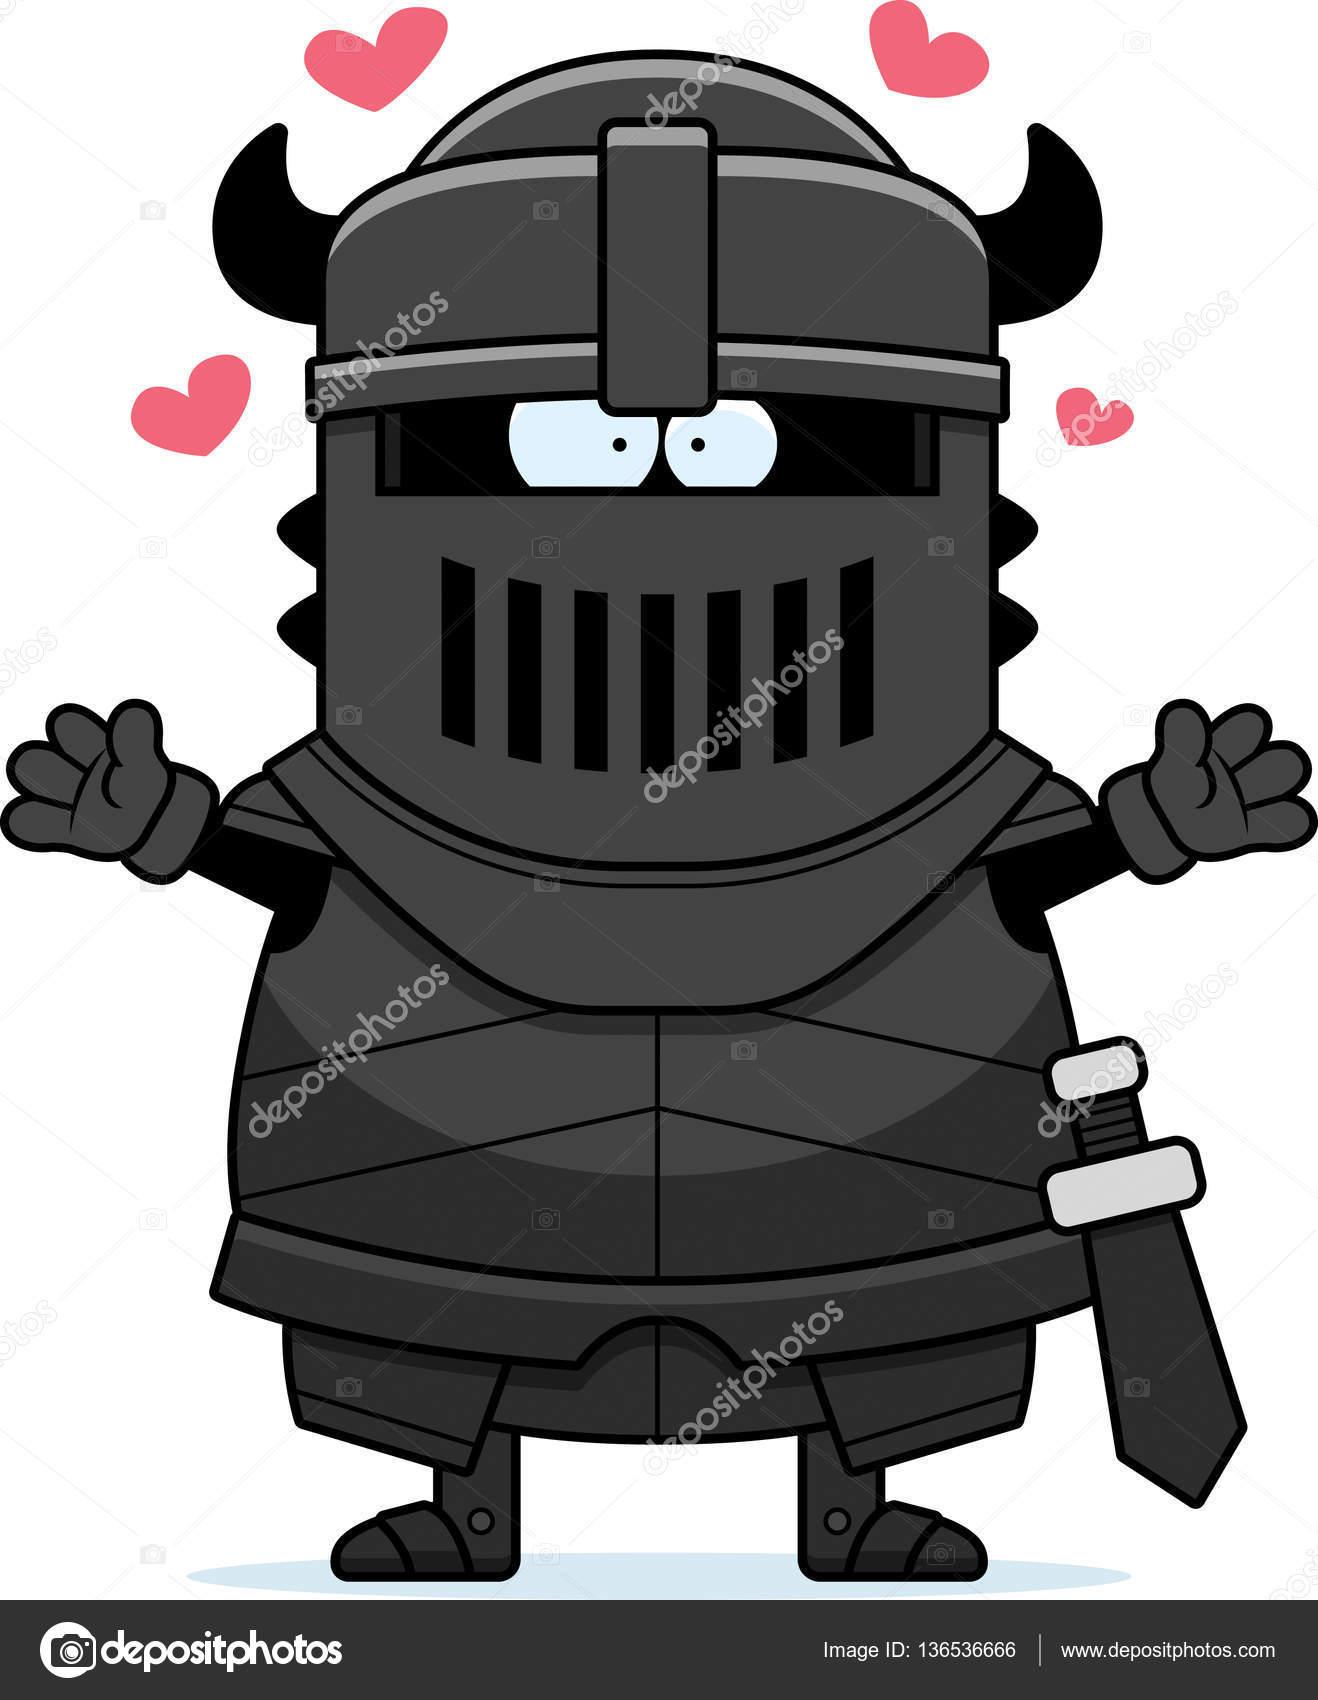 Dessin Anime Chevalier Noir Hug Image Vectorielle Cthoman C 136536666